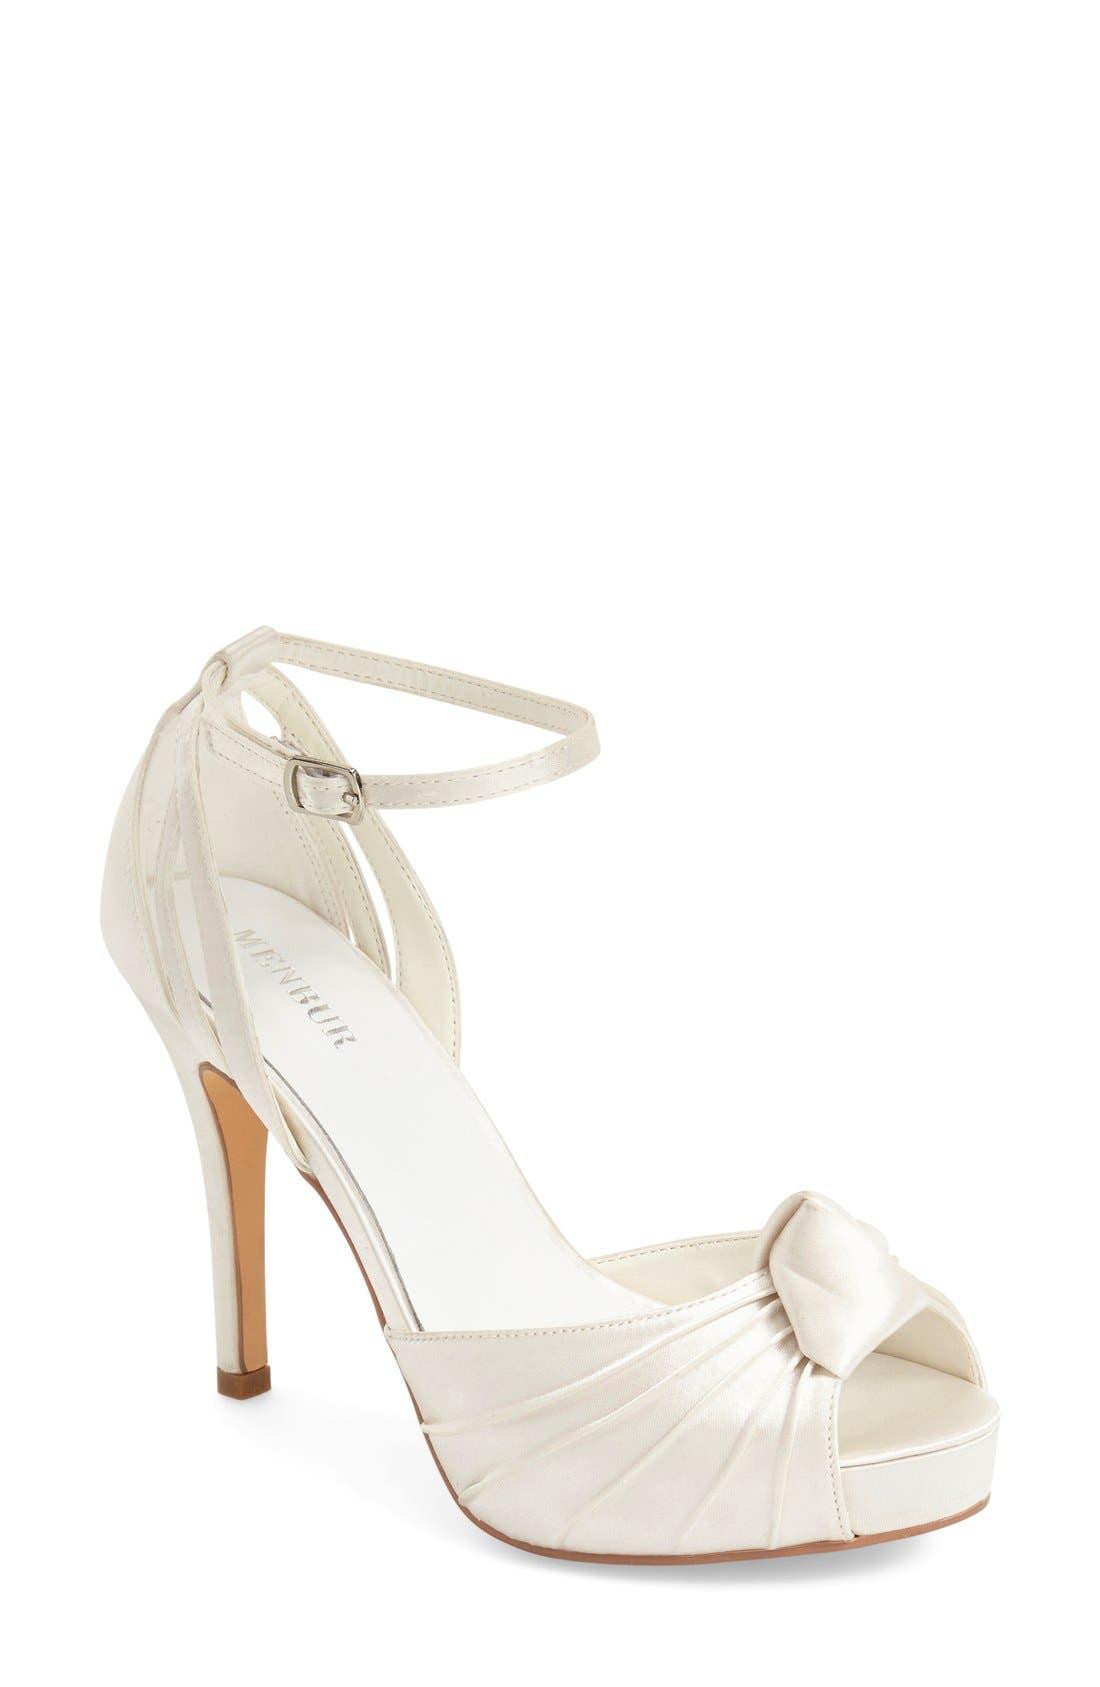 MENBUR 'Angelica' Satin Bridal Sandal